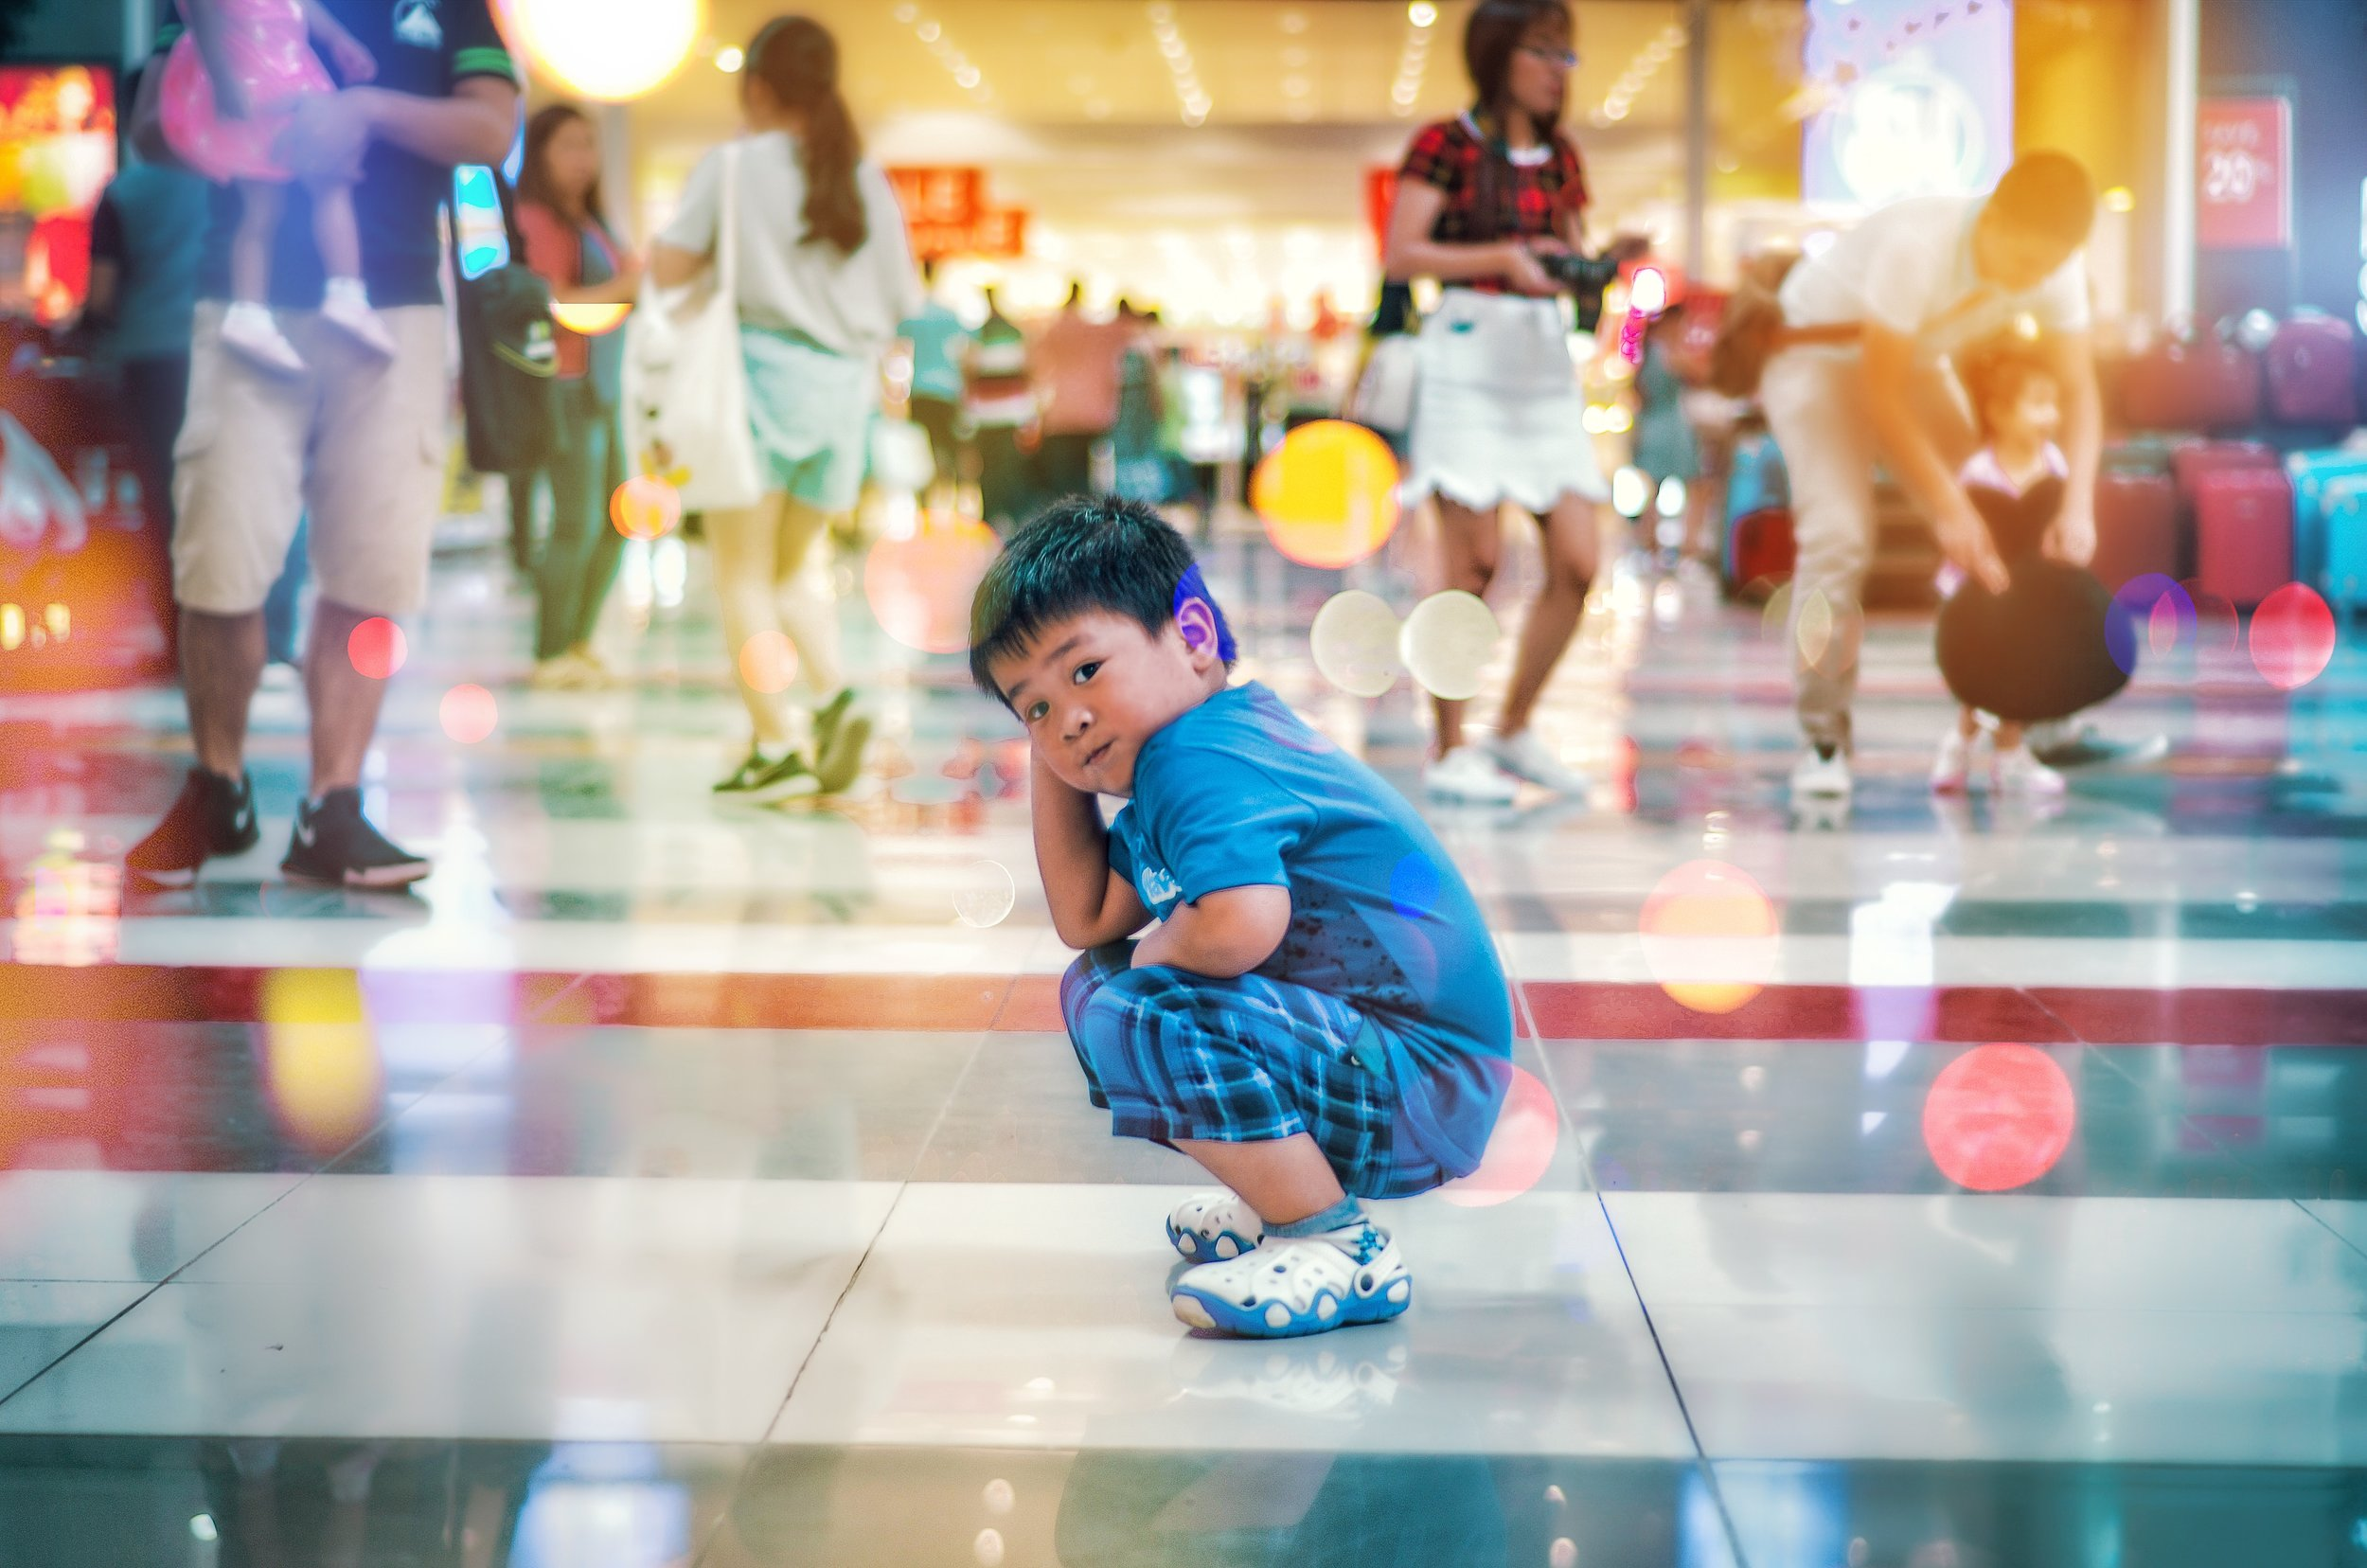 bokeh-boy-child-891289.jpg